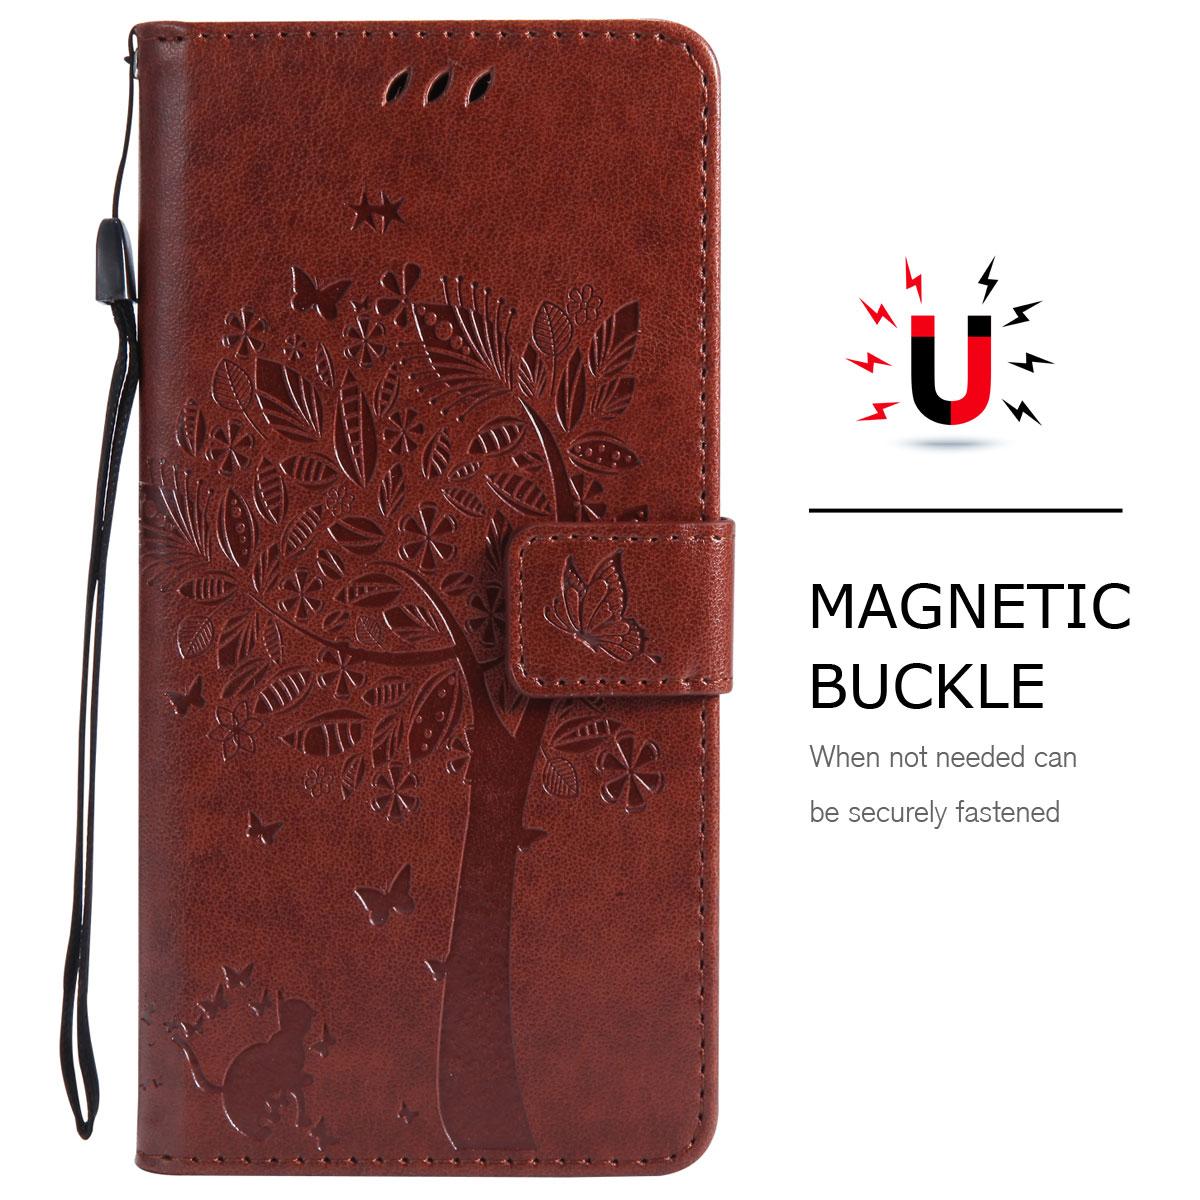 Magnetic-Leather-Credit-Card-Holder-Flip-Case-Cover-For-Google-Pixel-2-2-XL thumbnail 30